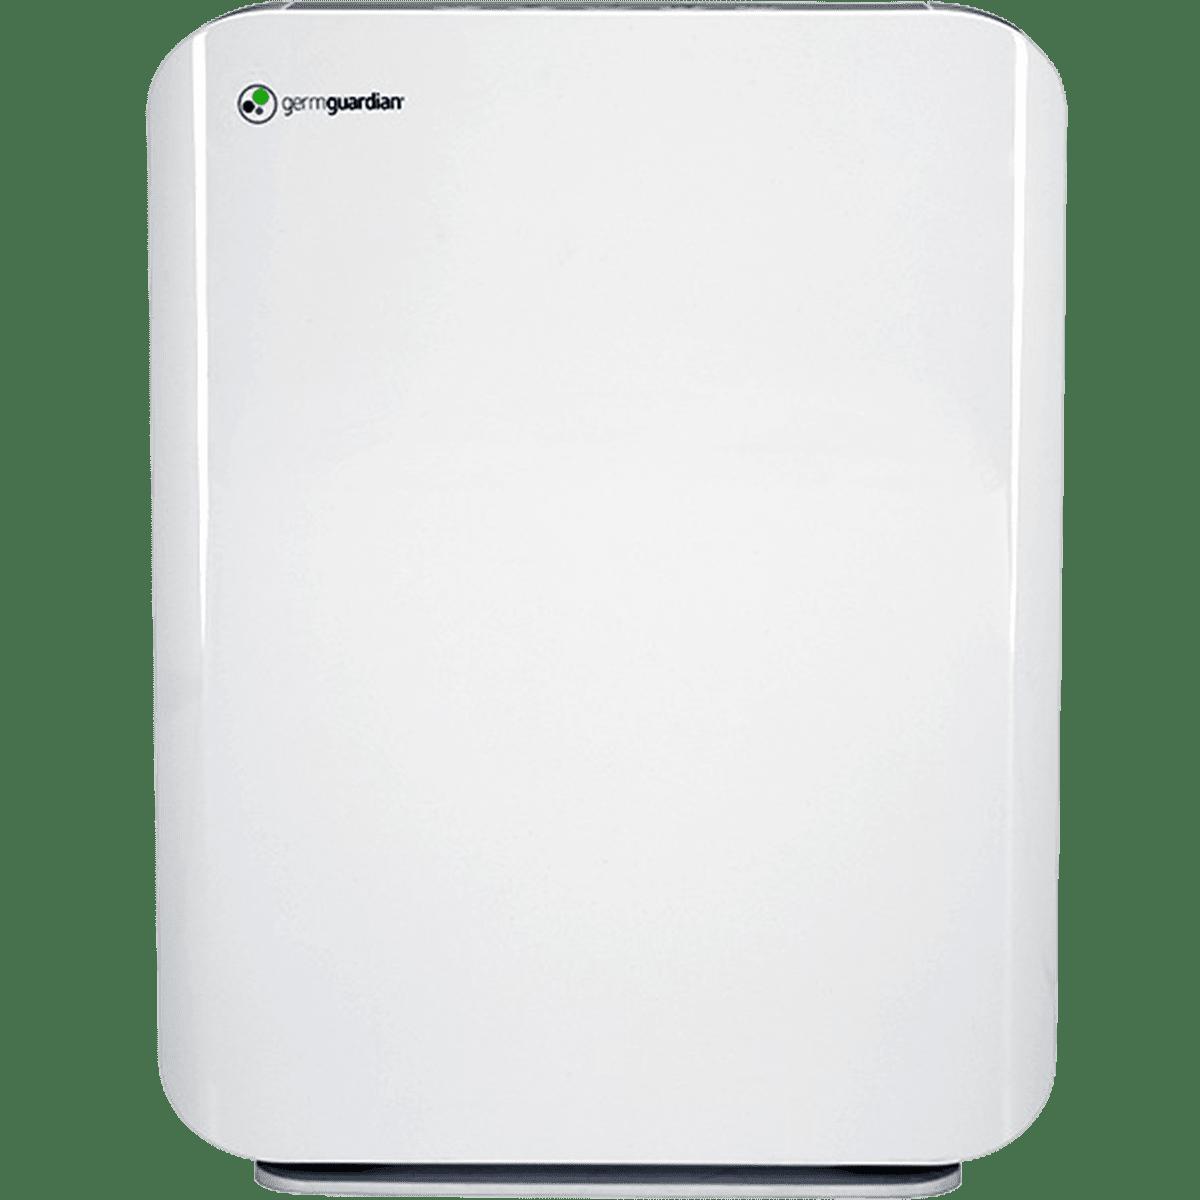 Germguardian Medium True Hepa Air Purifier Console Sylvane